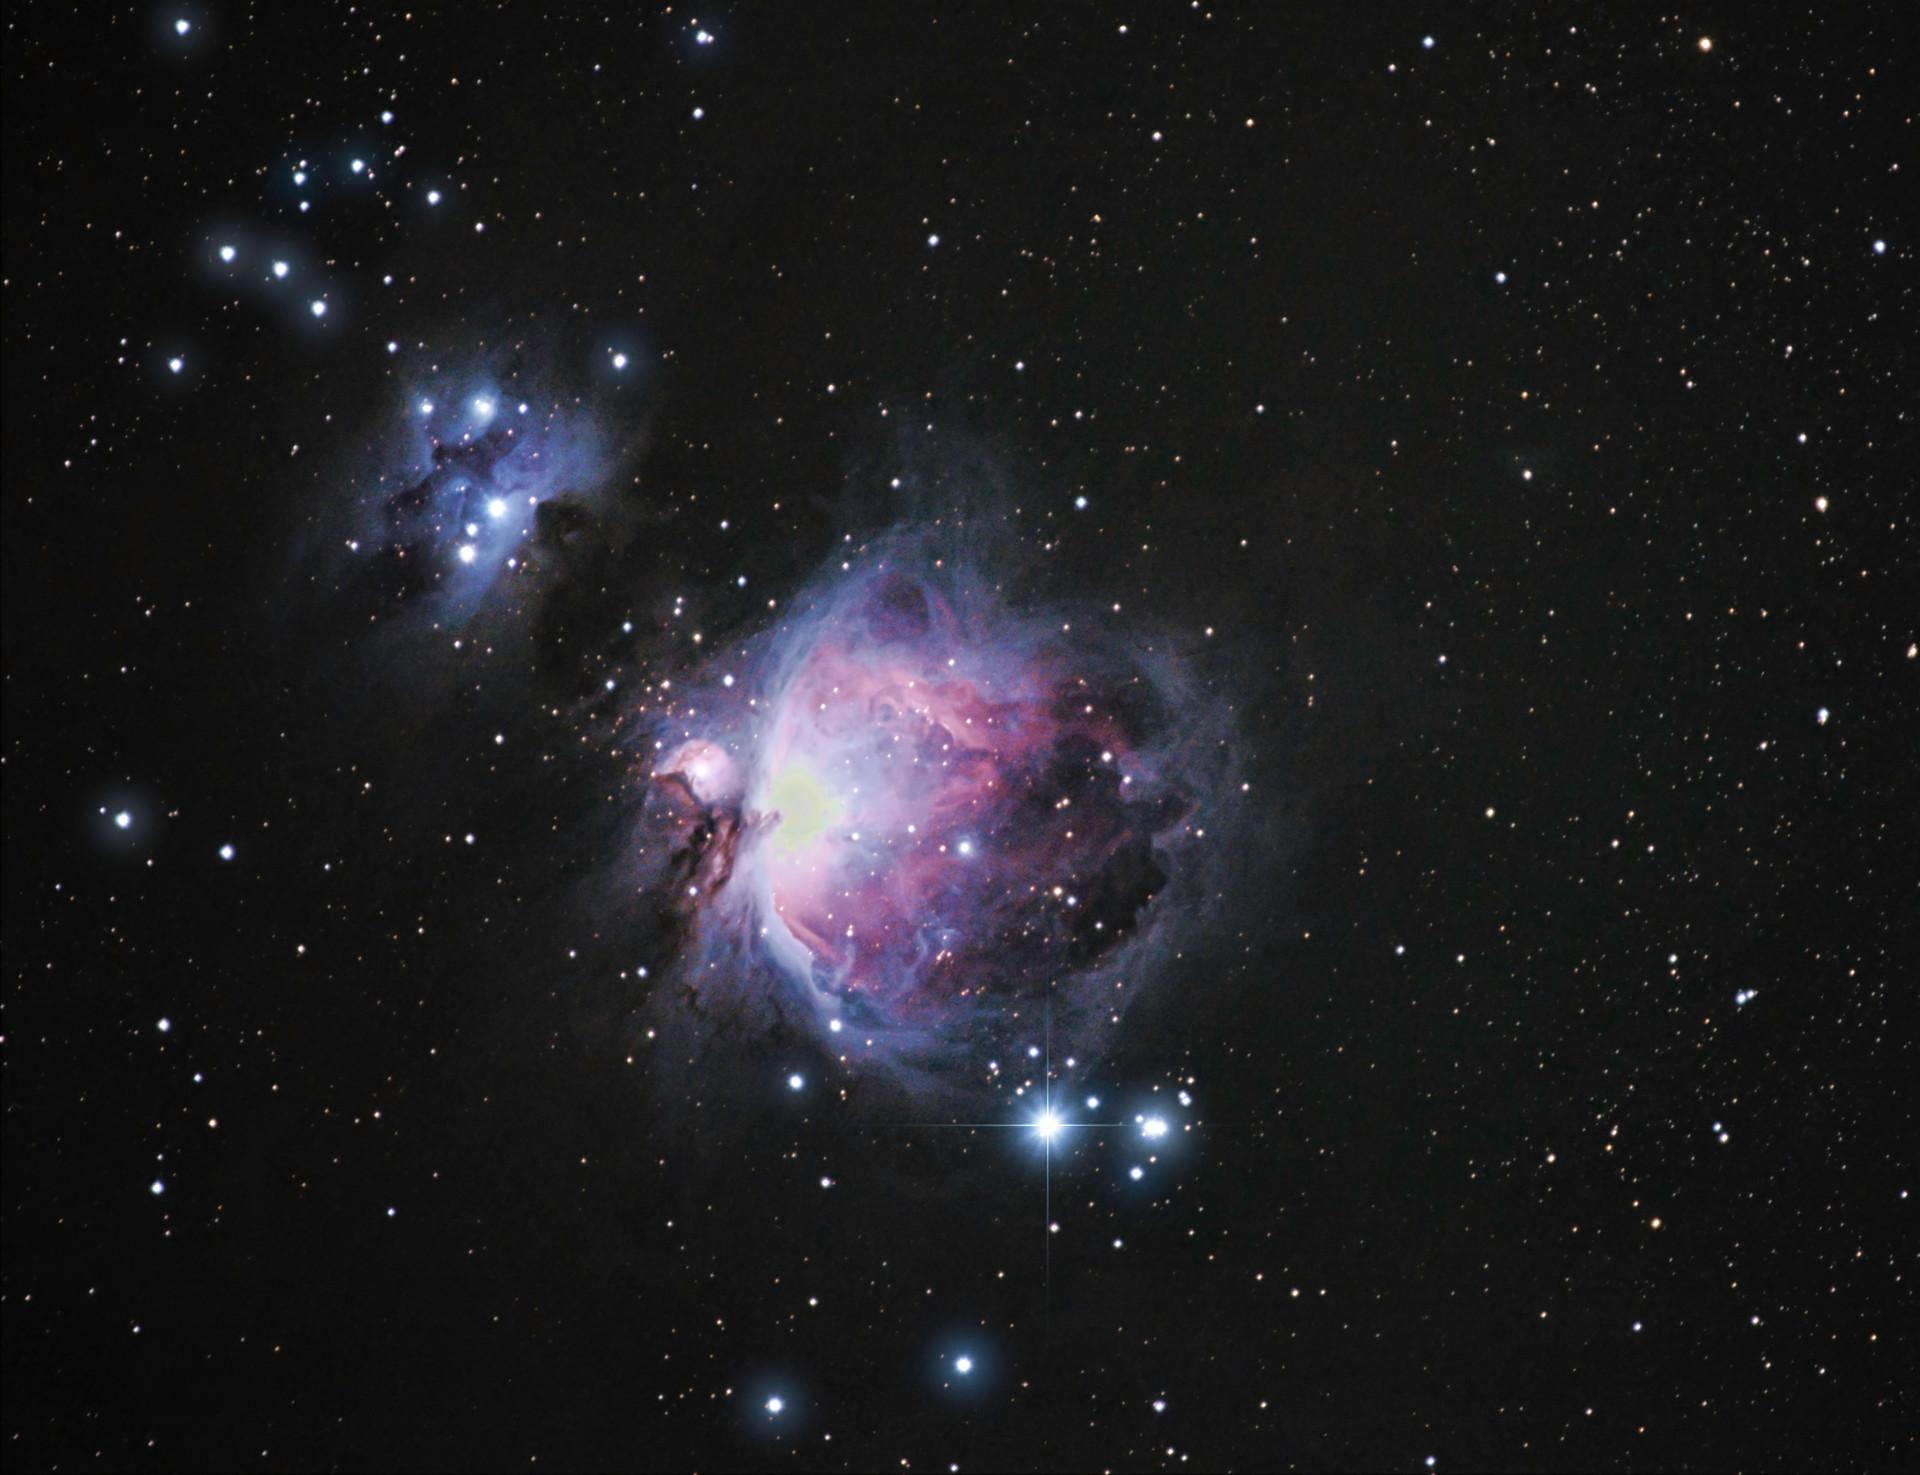 Orion & Running Man Nebulae